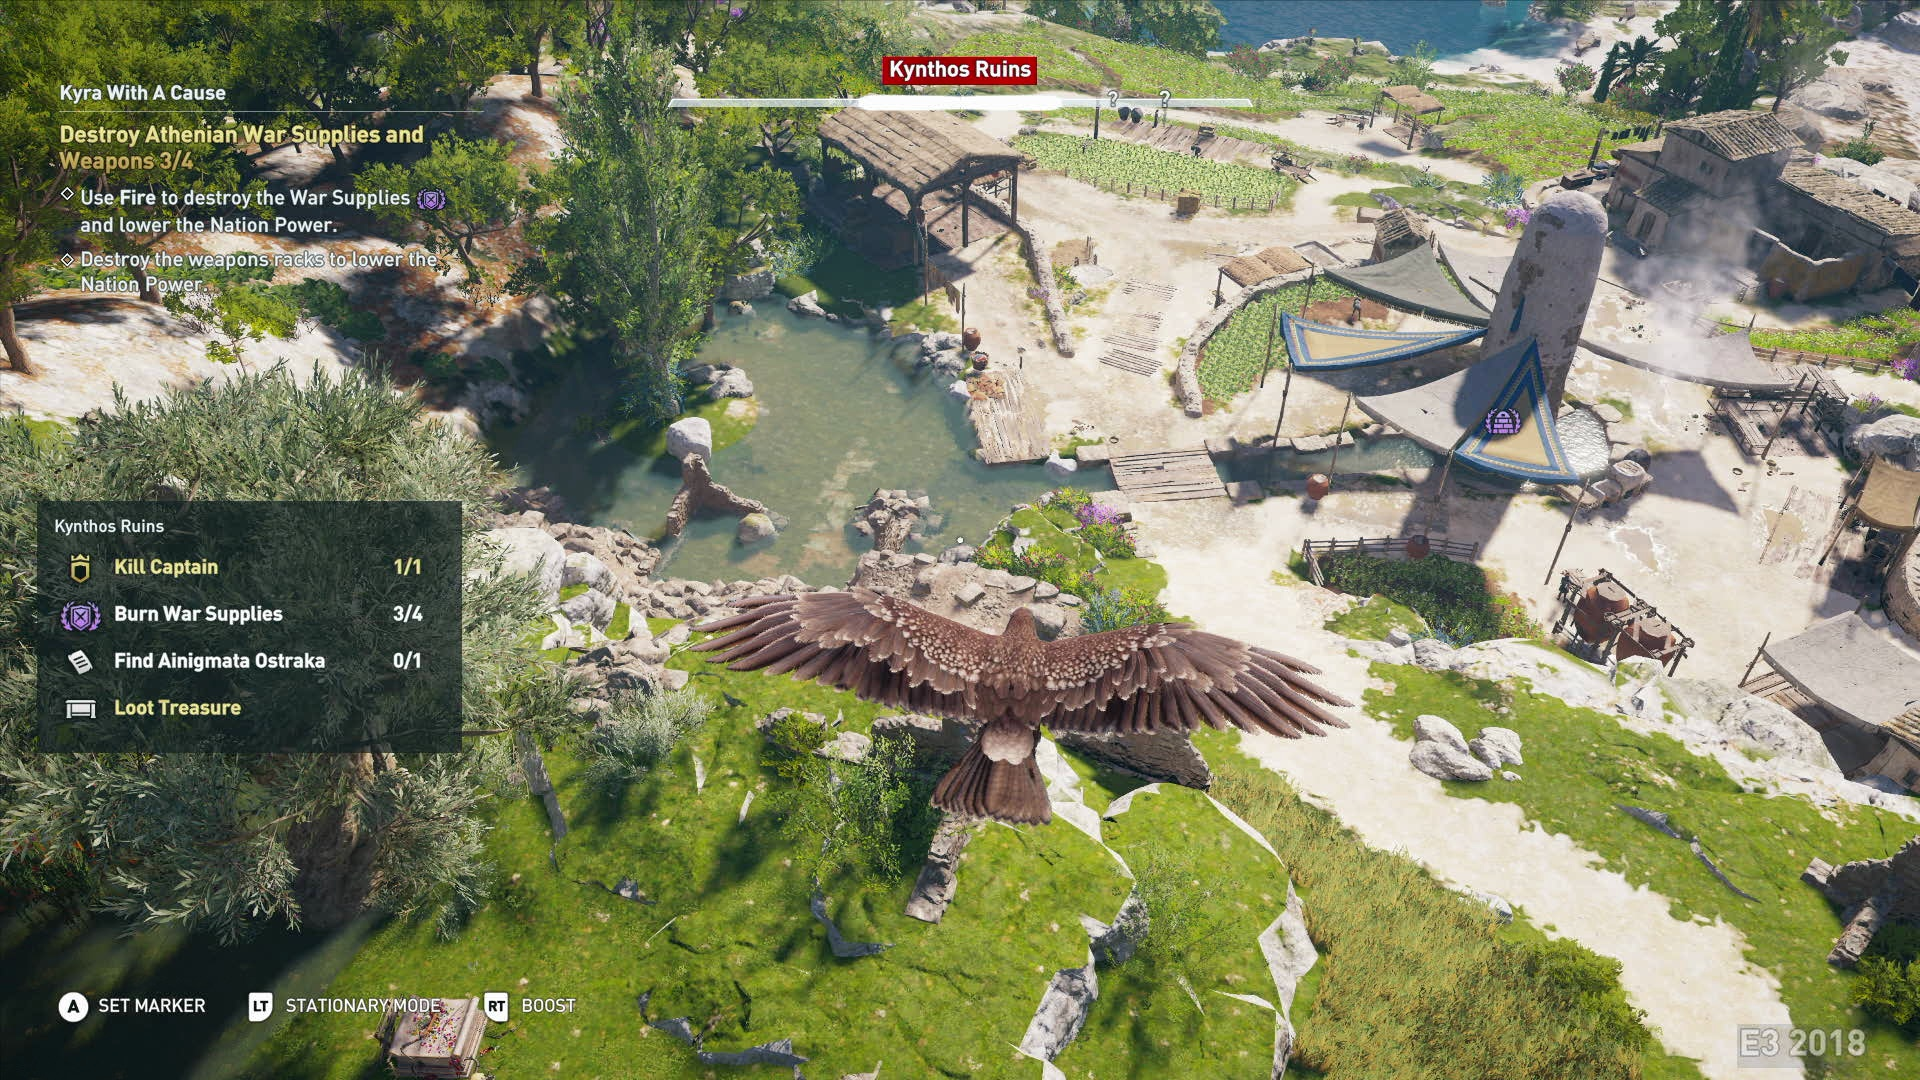 Assassins Creed Odyssey Leak 3